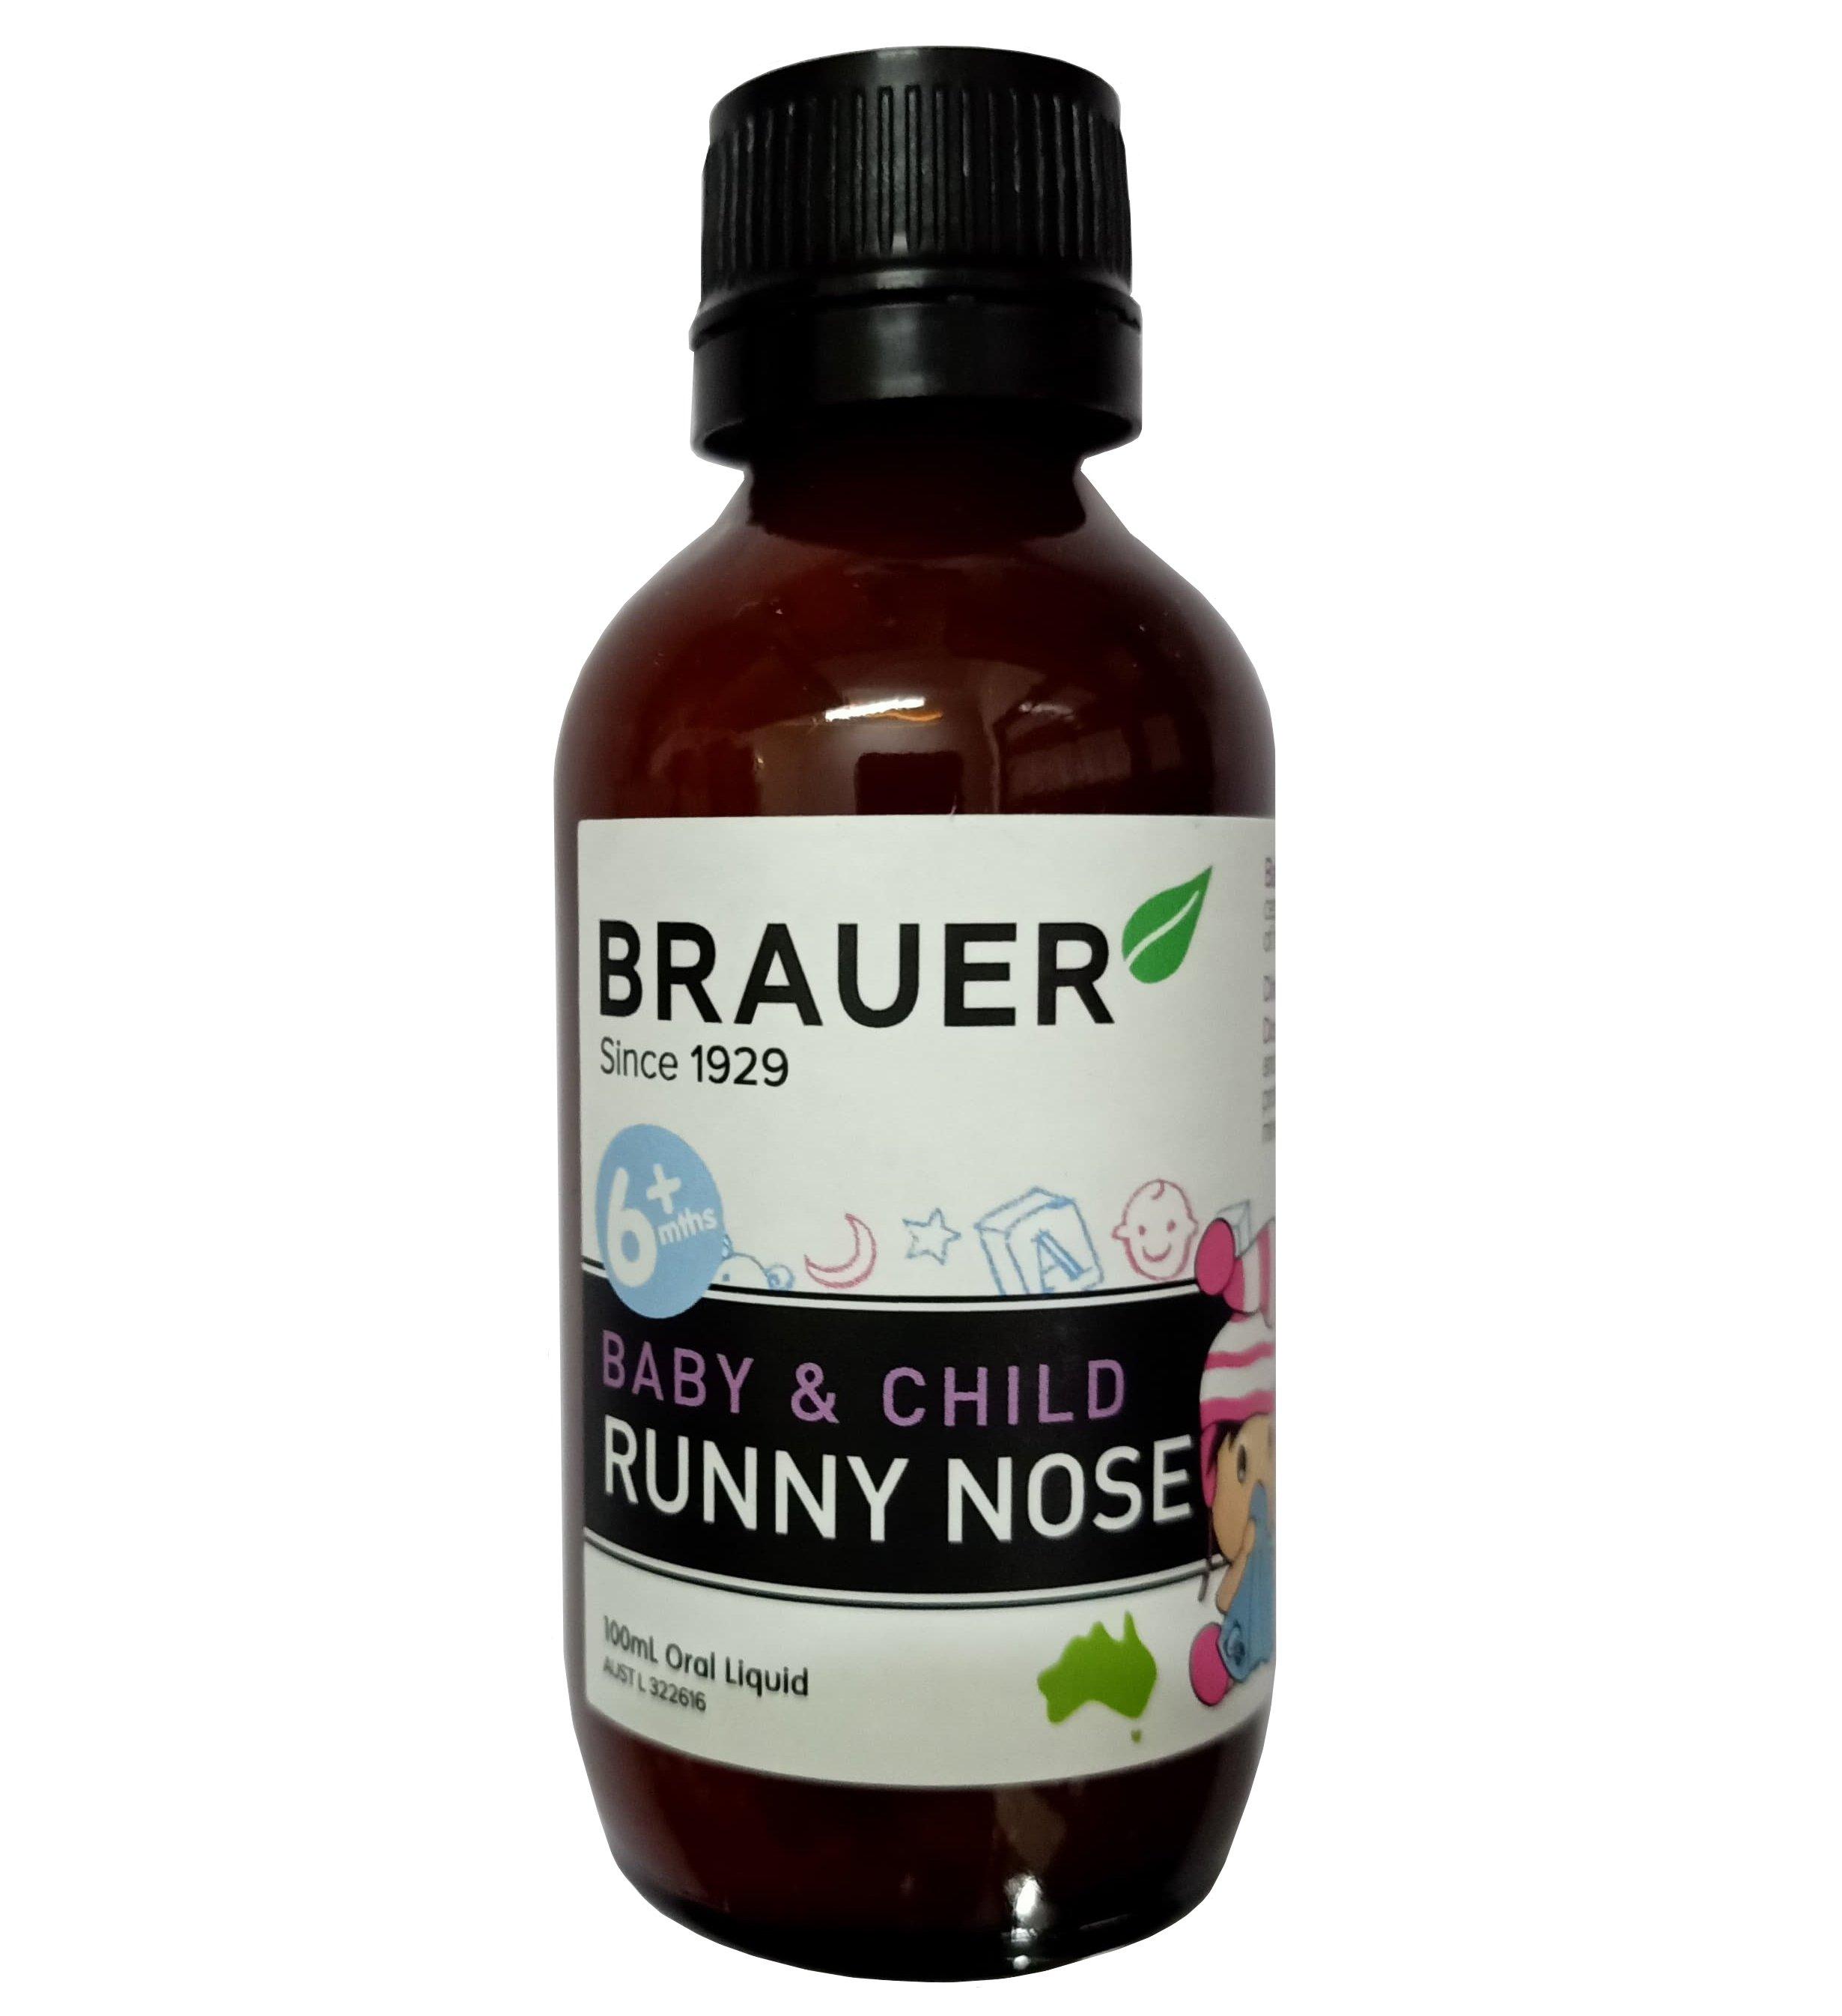 Siro Brauer Runny Nose 100ml mẫu mới